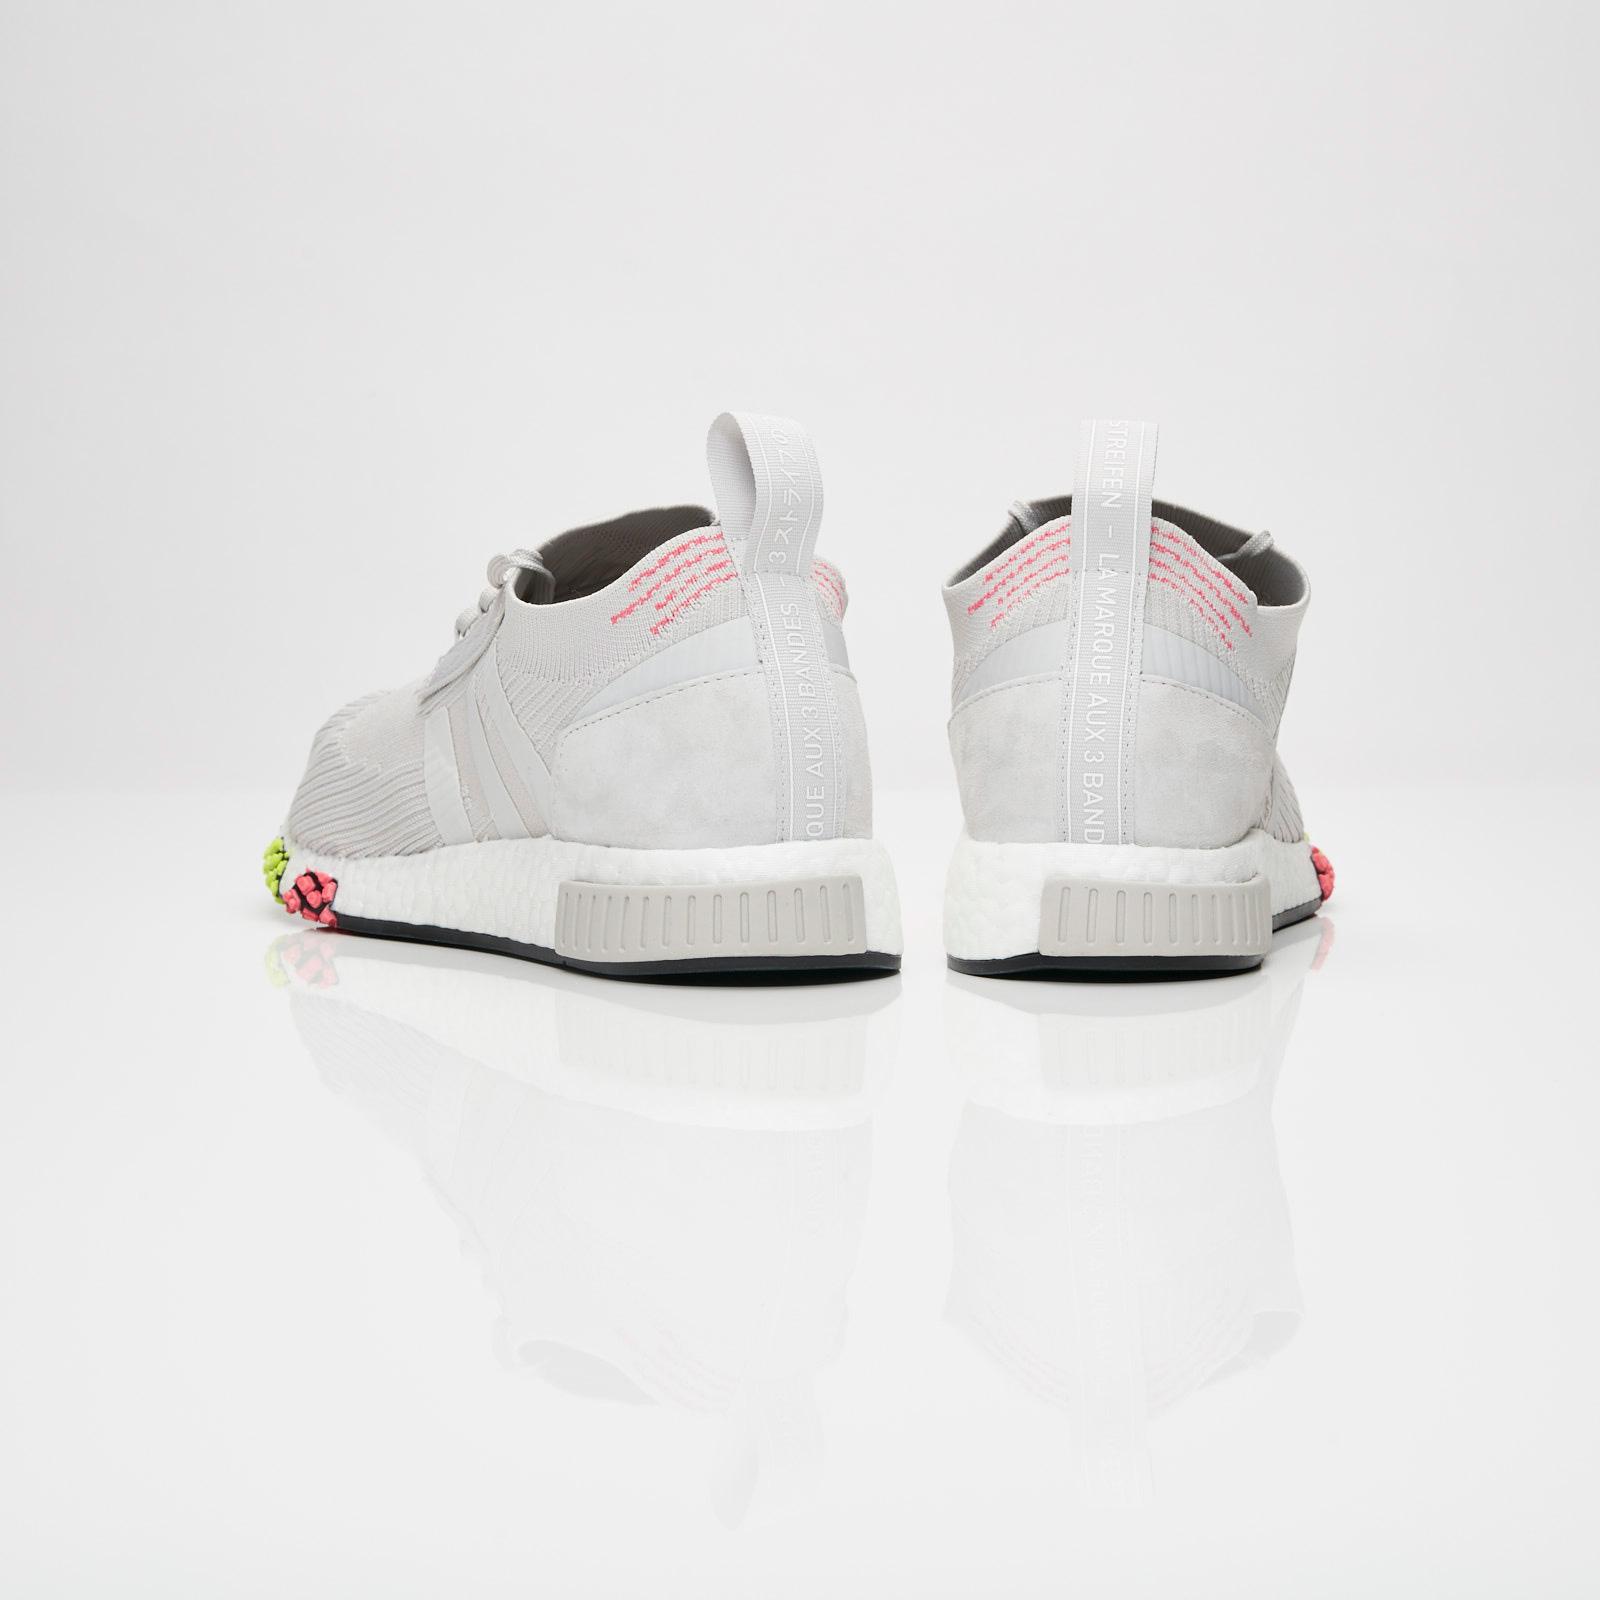 f6bbccd5e adidas NMD Racer PK - Cq2443 - Sneakersnstuff